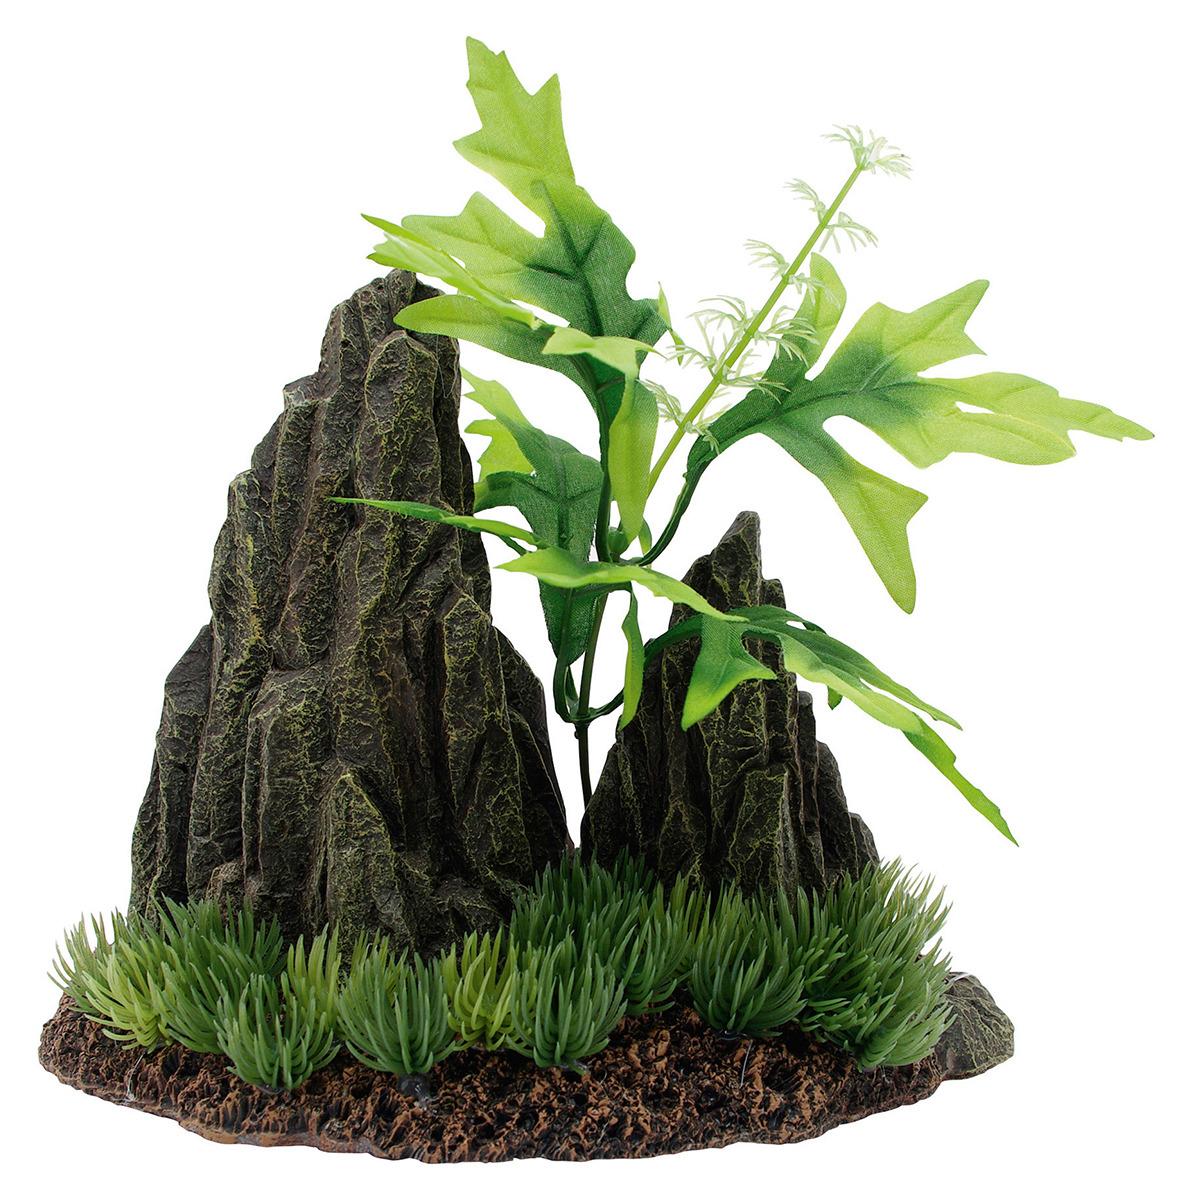 marina doppelte felsformation mit pflanzen. Black Bedroom Furniture Sets. Home Design Ideas